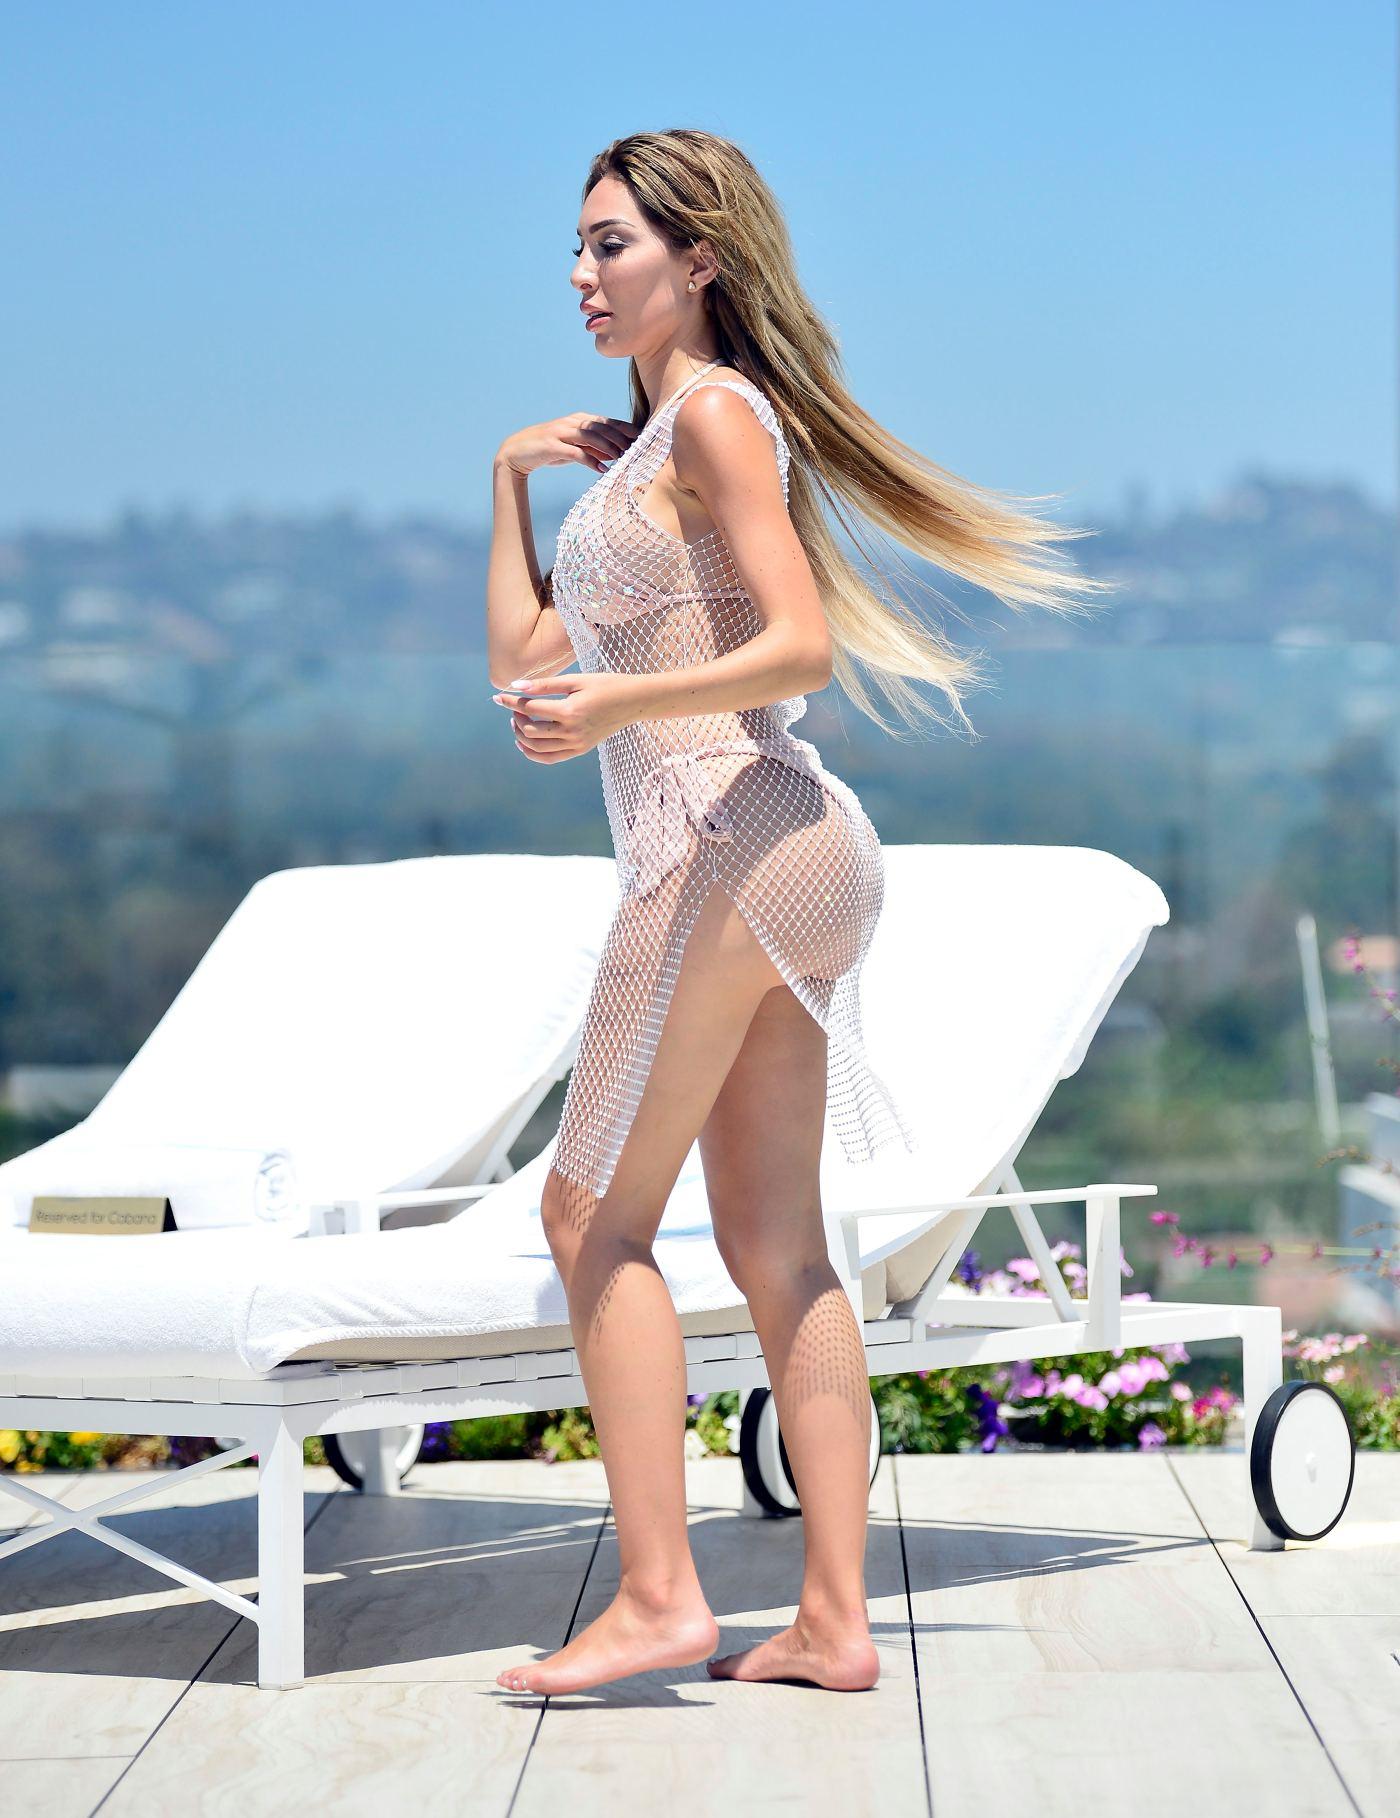 Farrah Abraham Wears Nude Bikini at the Pool During Heat Wave